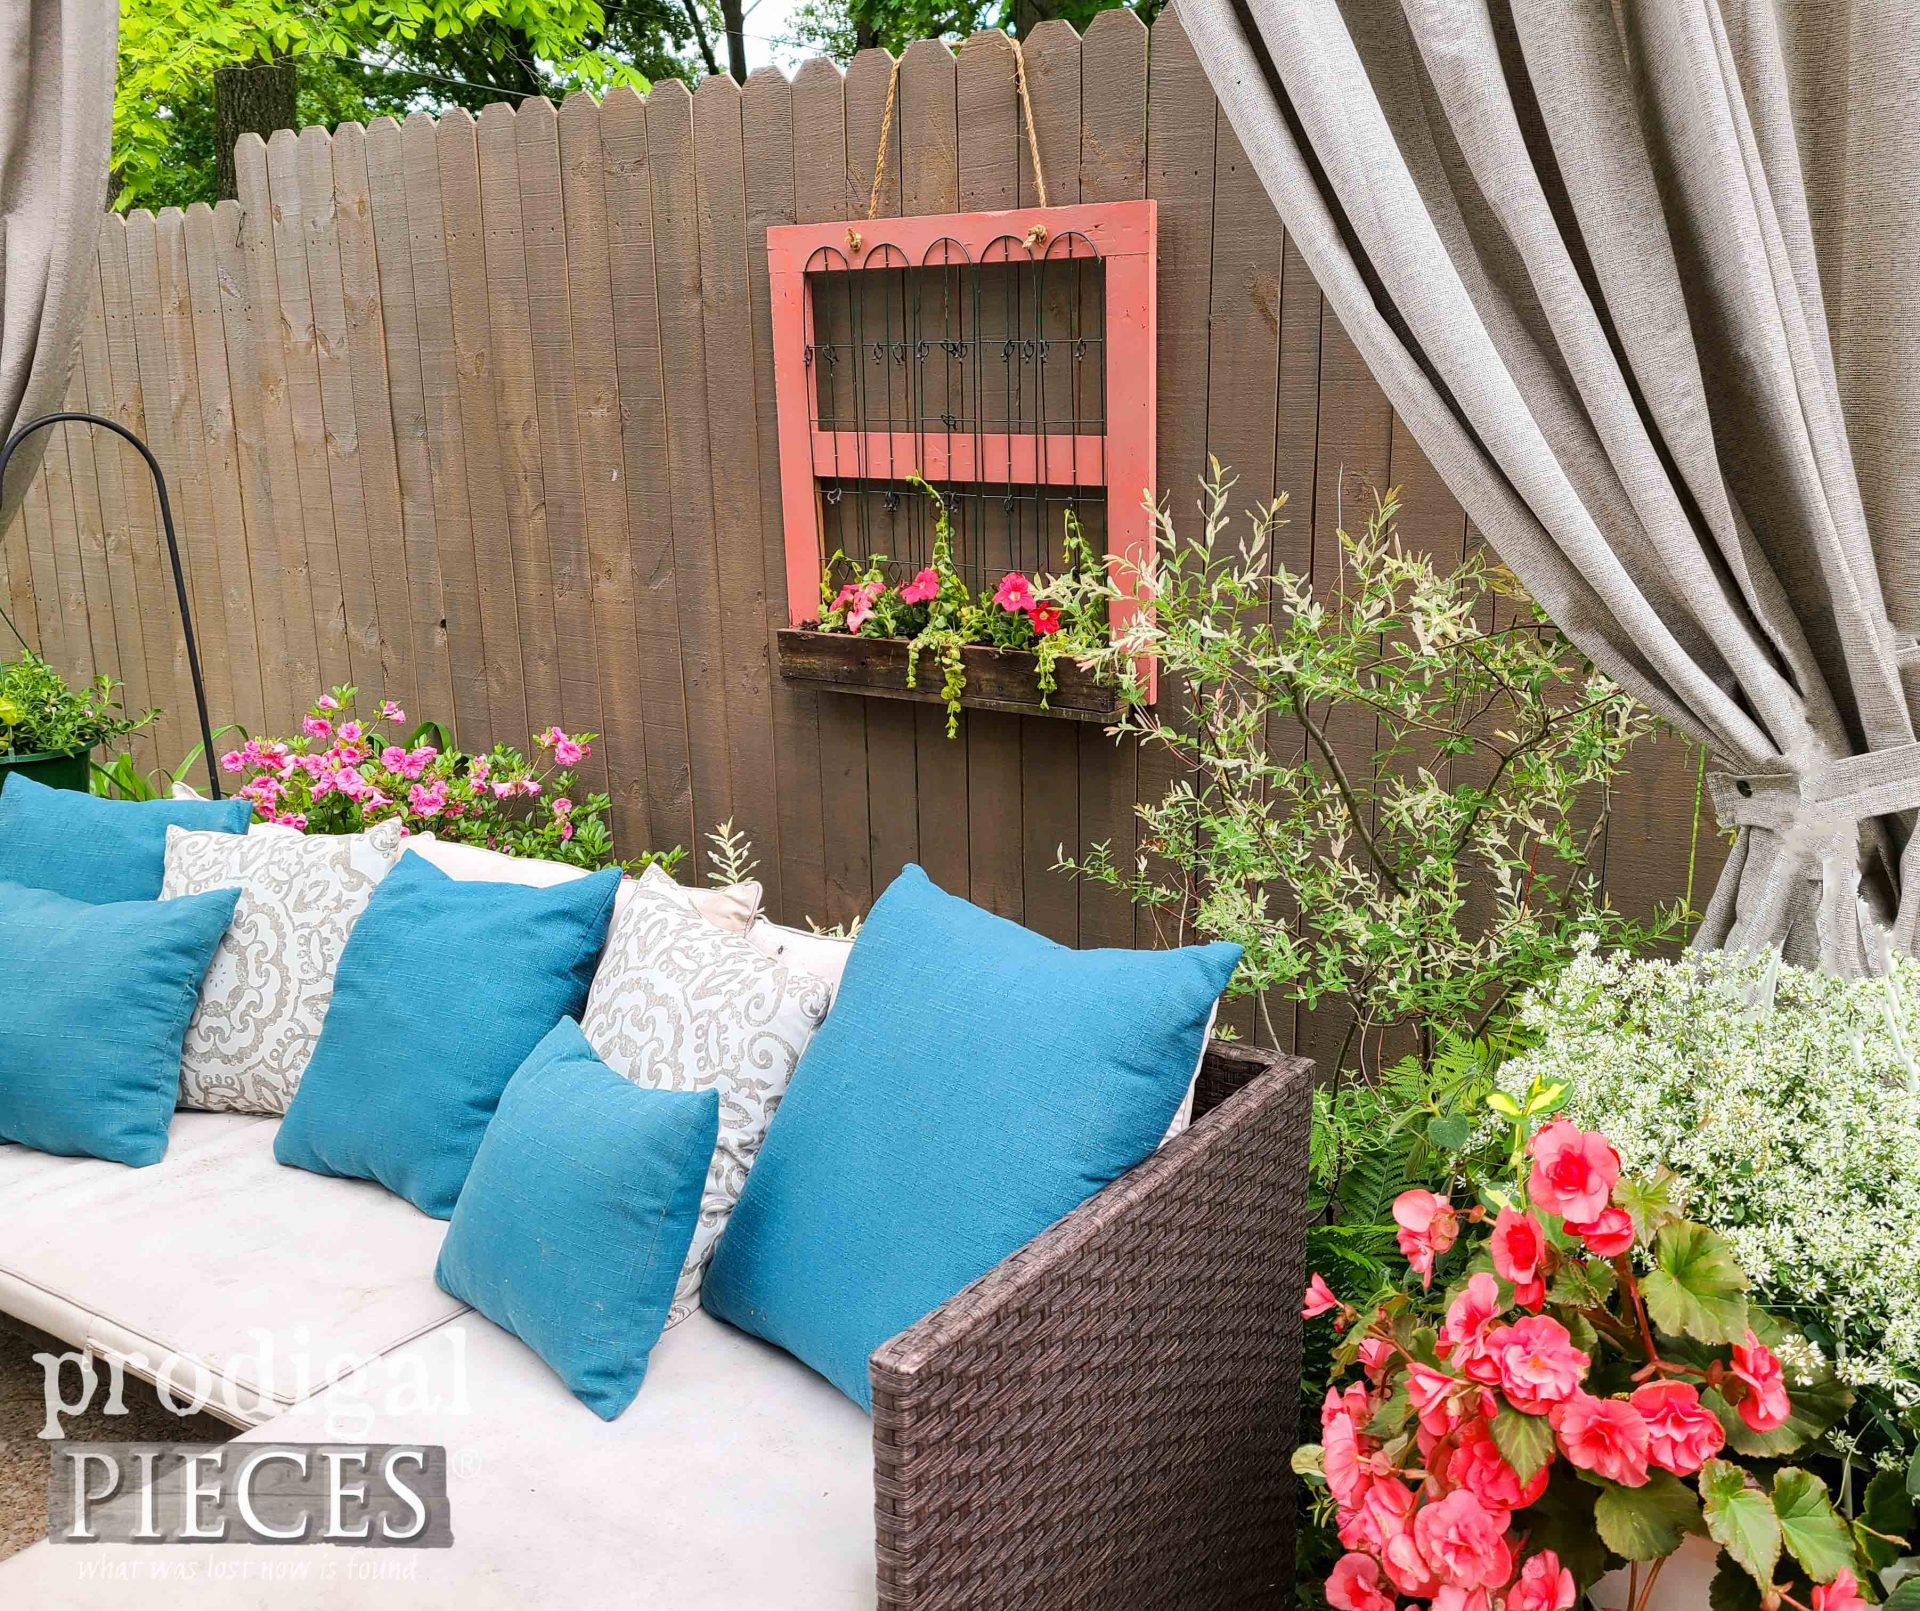 Relcaimed Hanging Fence Planter by Larissa of Prodigal Pieces | prodigalpieces.com #prodigalpieces #garden #farmhouse #home #homedecor